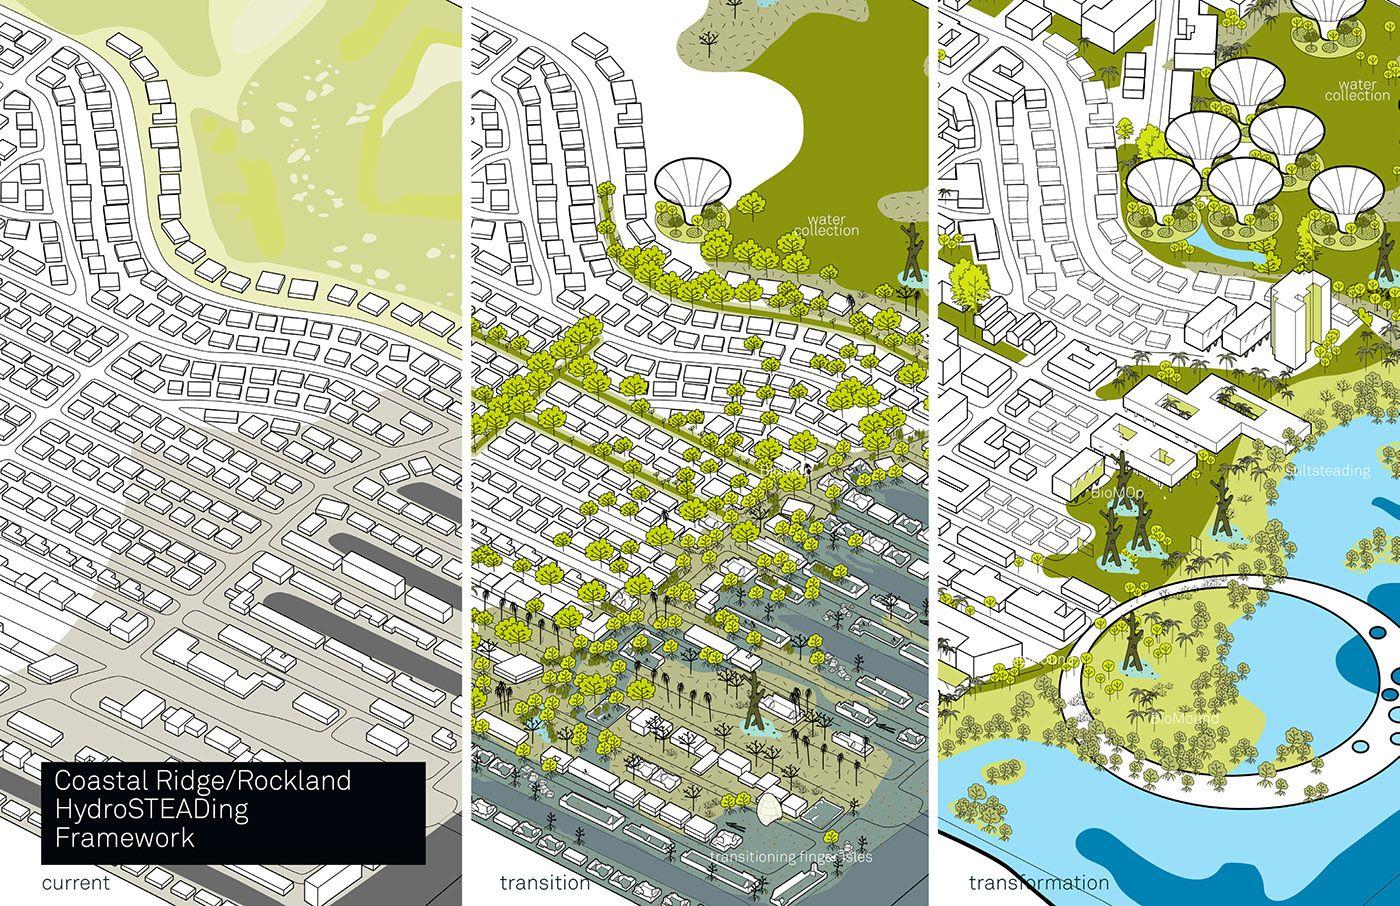 unplanning miami: a sea level rise adaptation strategy on